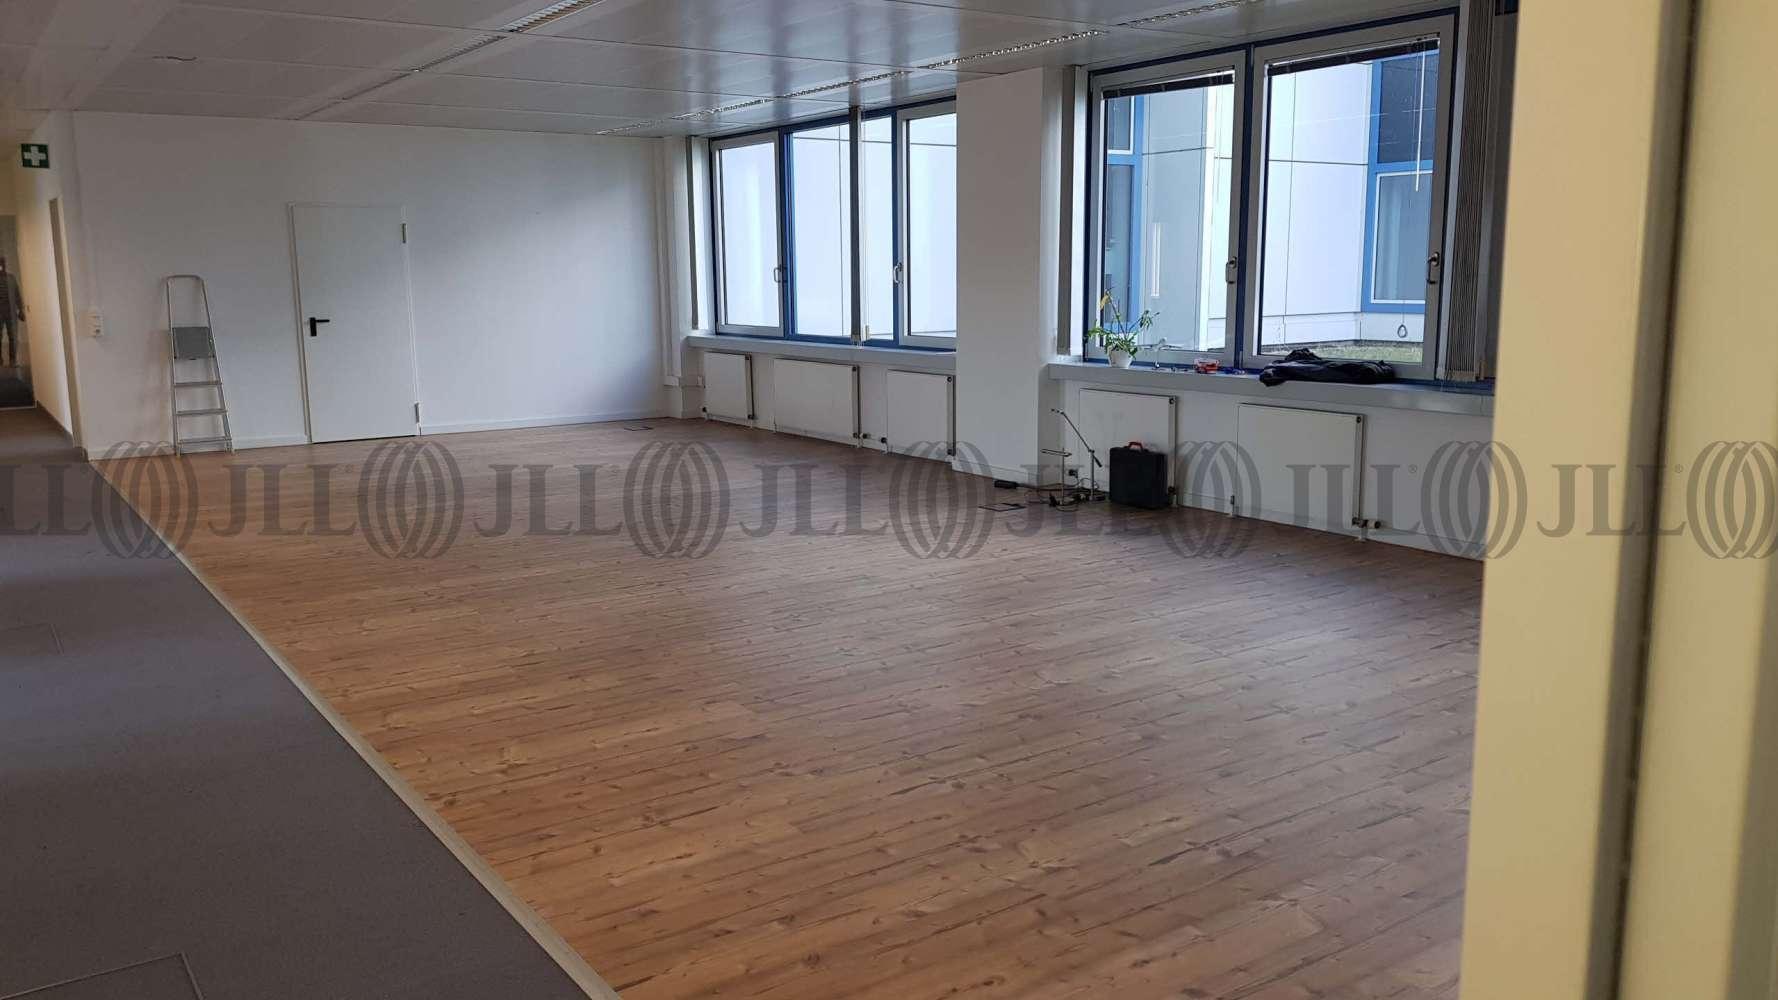 Büros Frankfurt am main, 60437 - Büro - Frankfurt am Main, Nieder-Eschbach - F1908 - 10645645